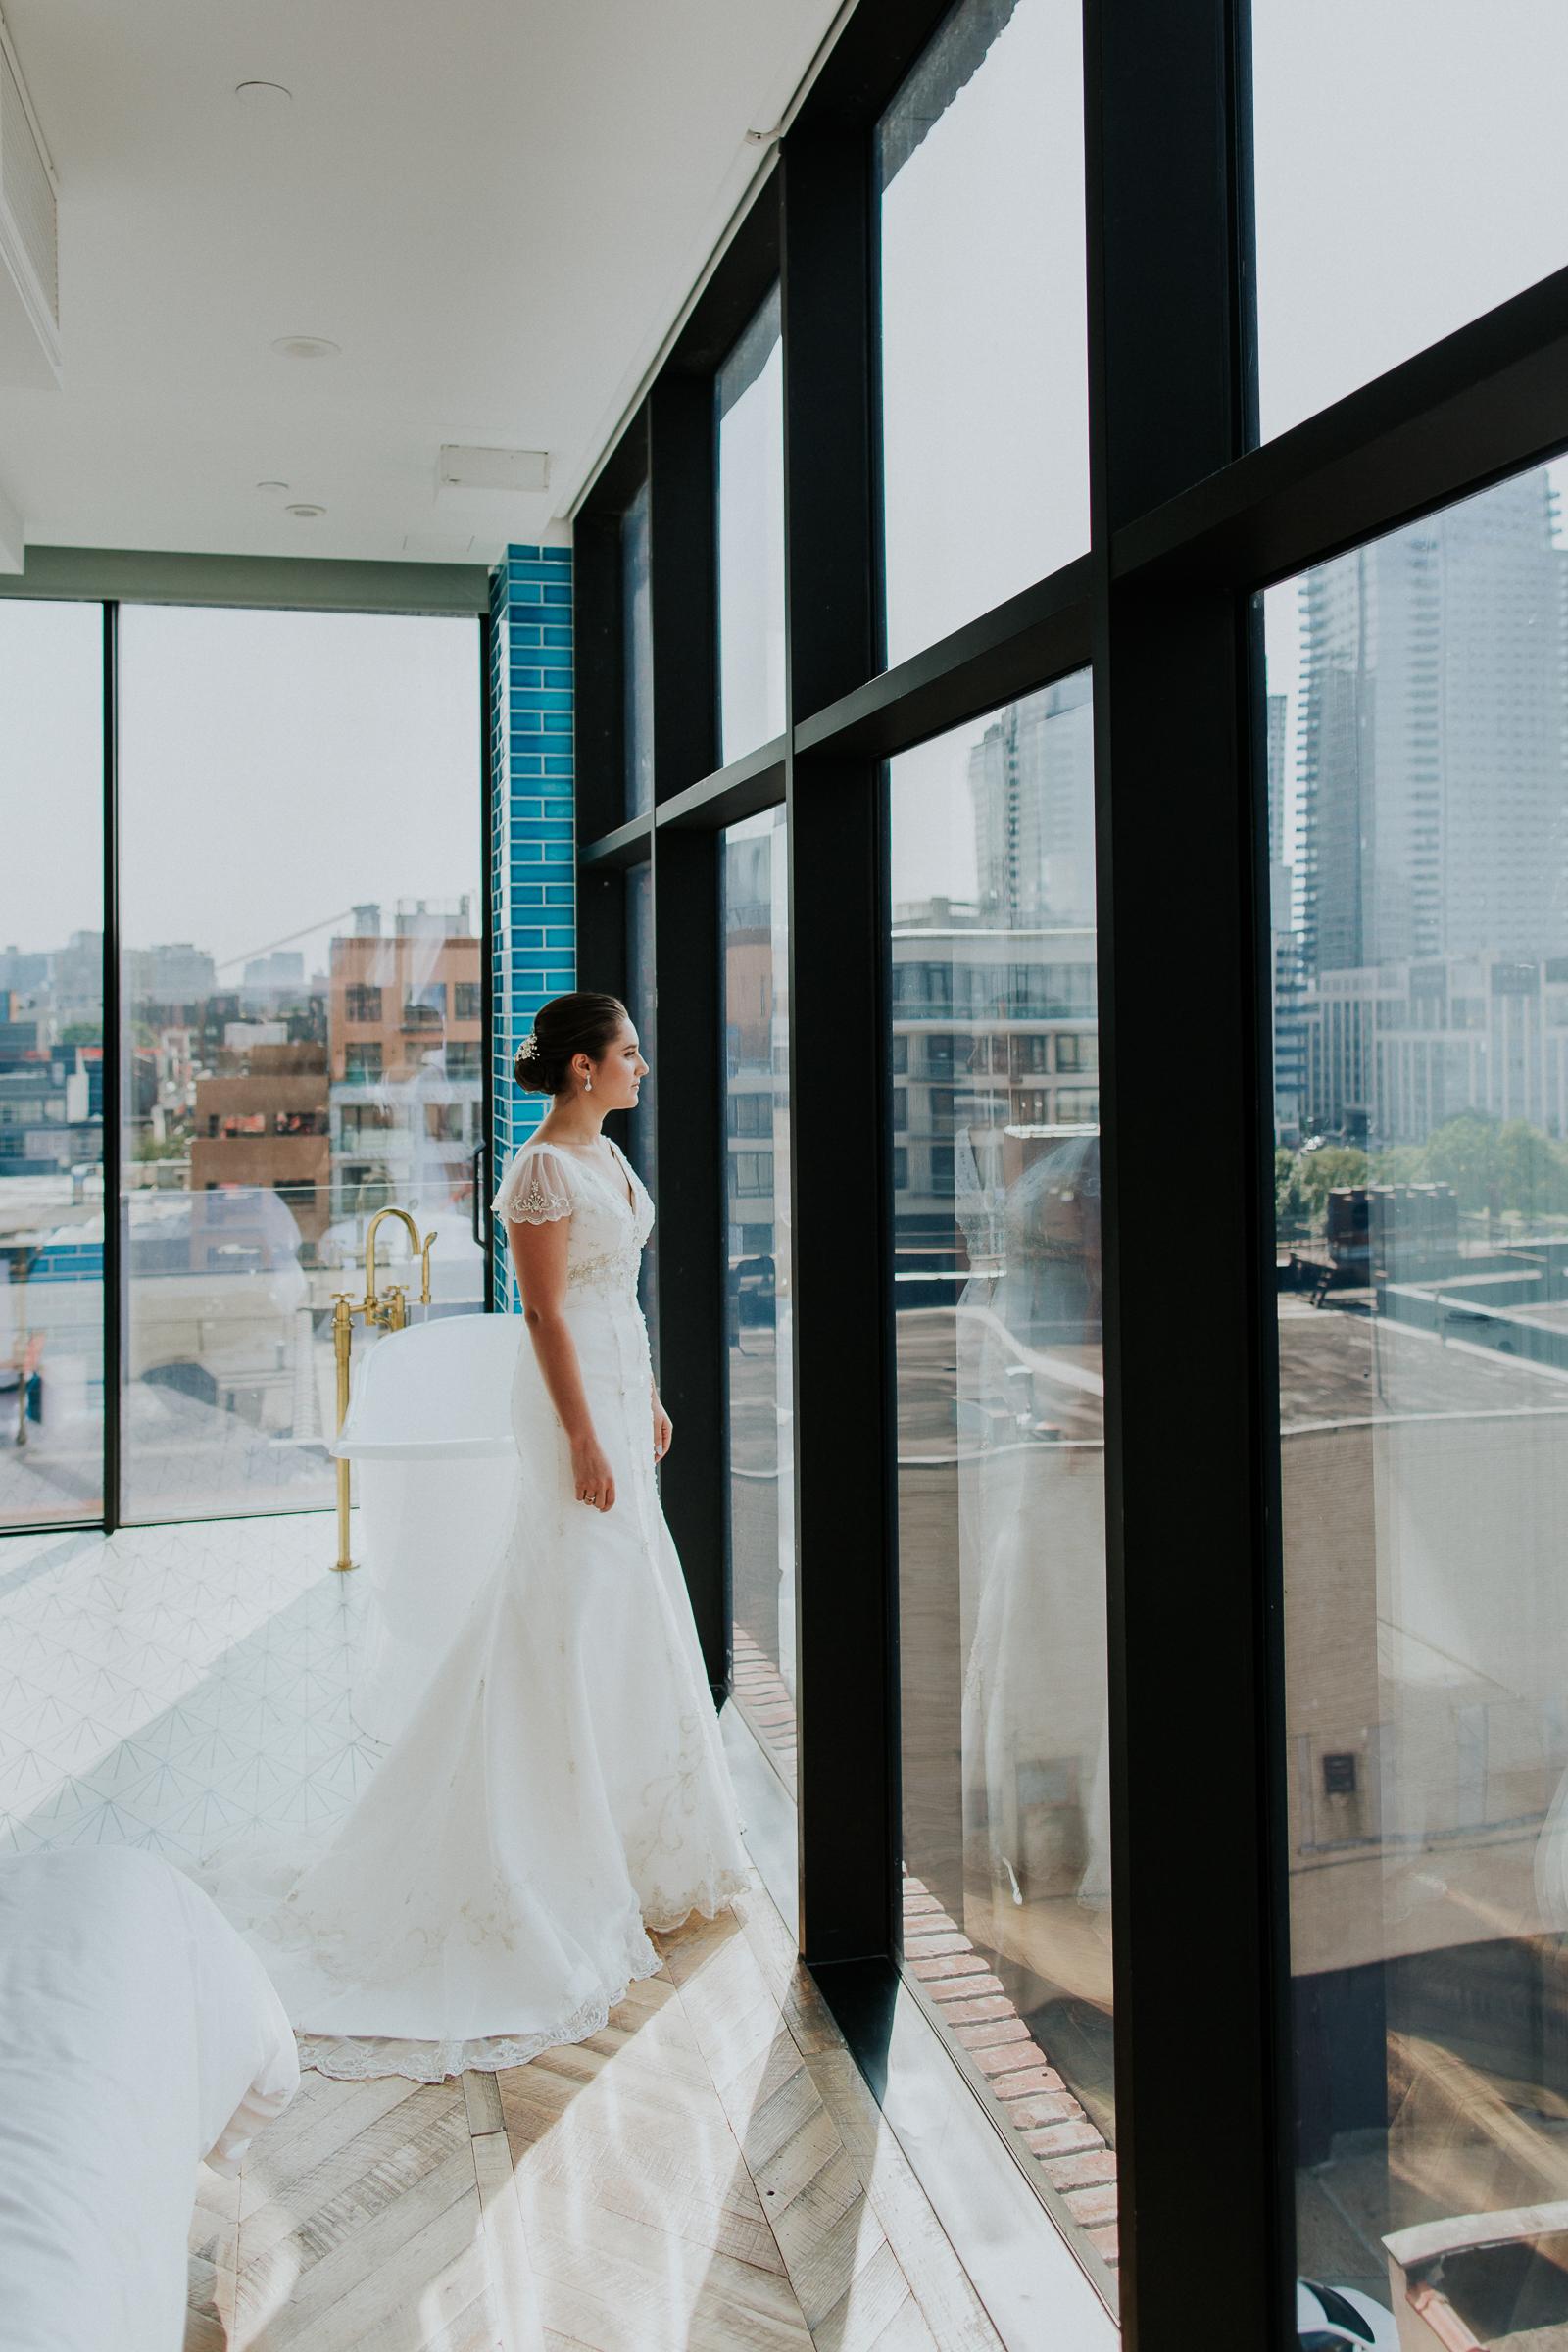 Brooklyn-Winery-NYC-Editorial-Documentary-Wedding-Photographer-Gina-Oli-16.jpg